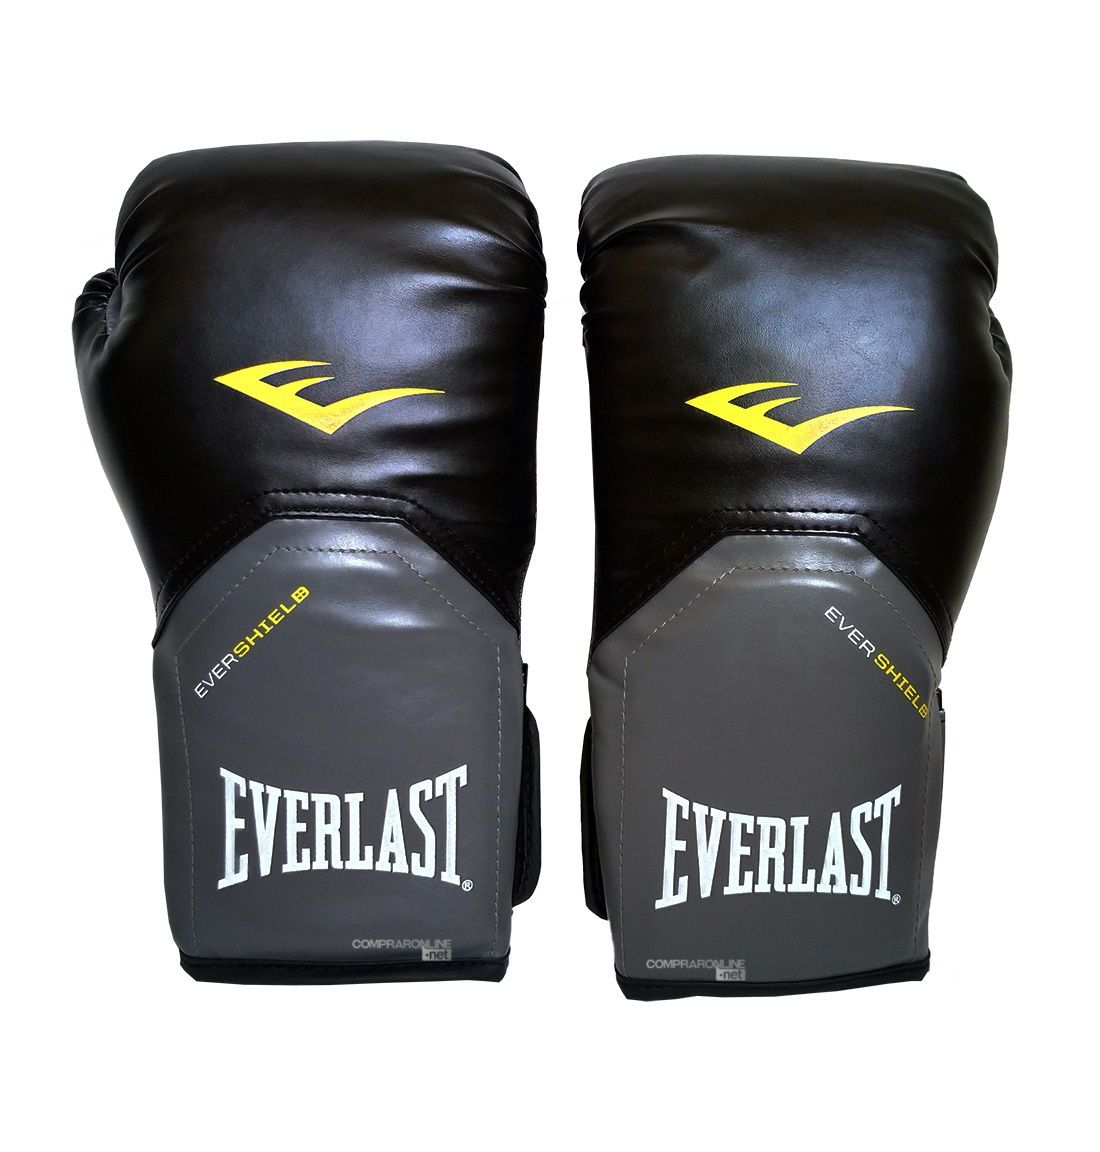 694109261 Luva Muay Thai Boxe 12 Oz Everlast Pro Style Preta - Comprar Online .Net